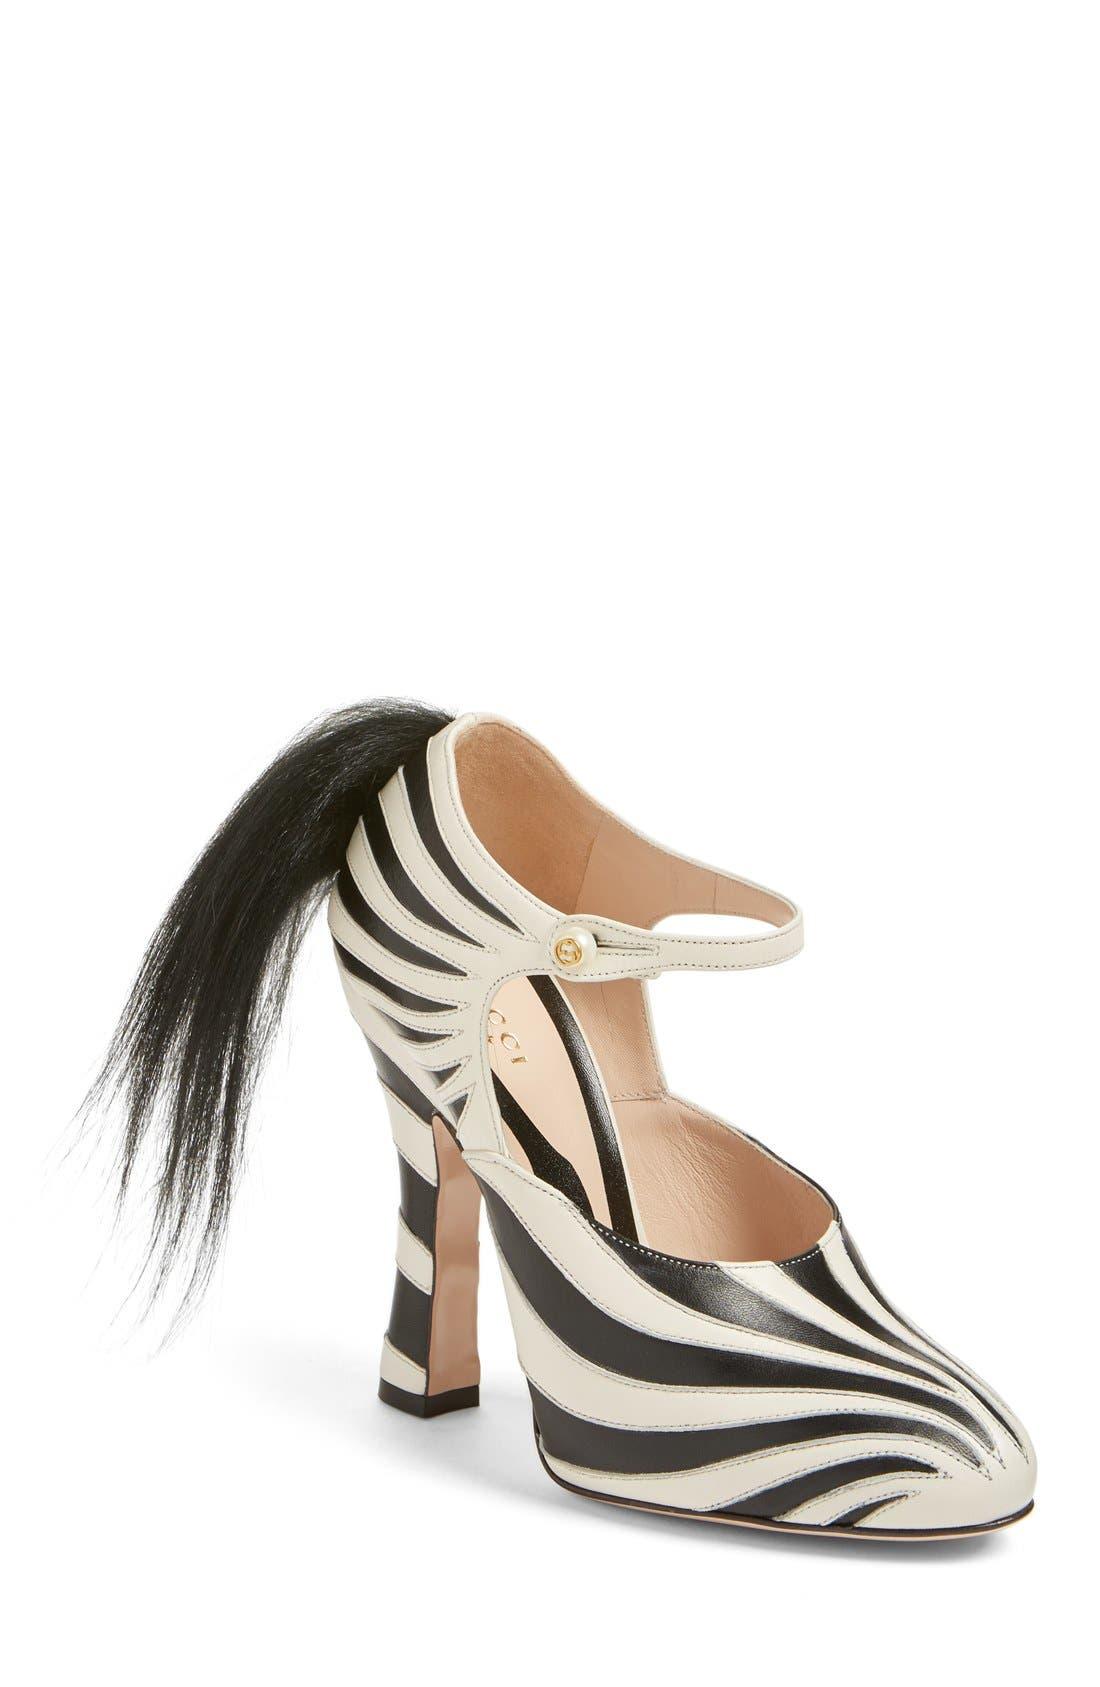 GUCCI, 'Lesley' Zebra Stripe Pump, Main thumbnail 1, color, 124